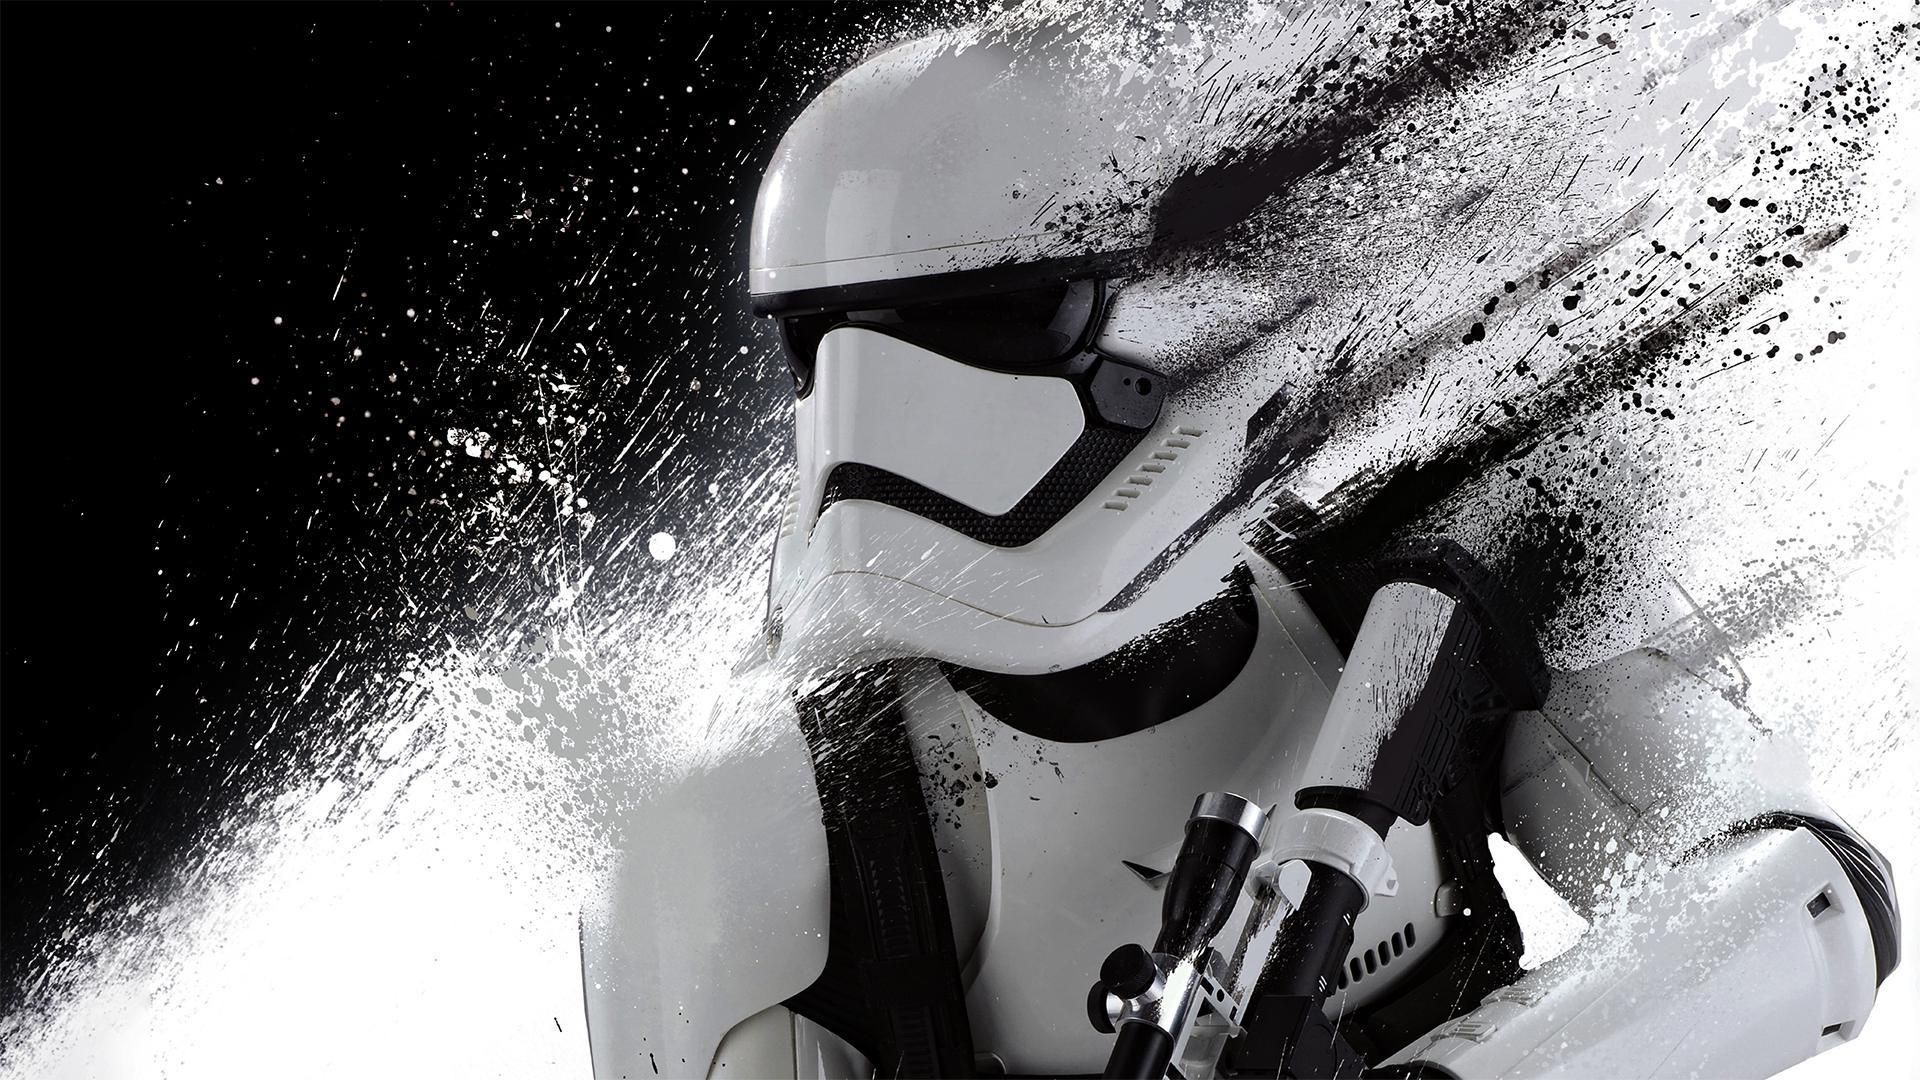 69+ storm trooper wallpapers on wallpaperplay